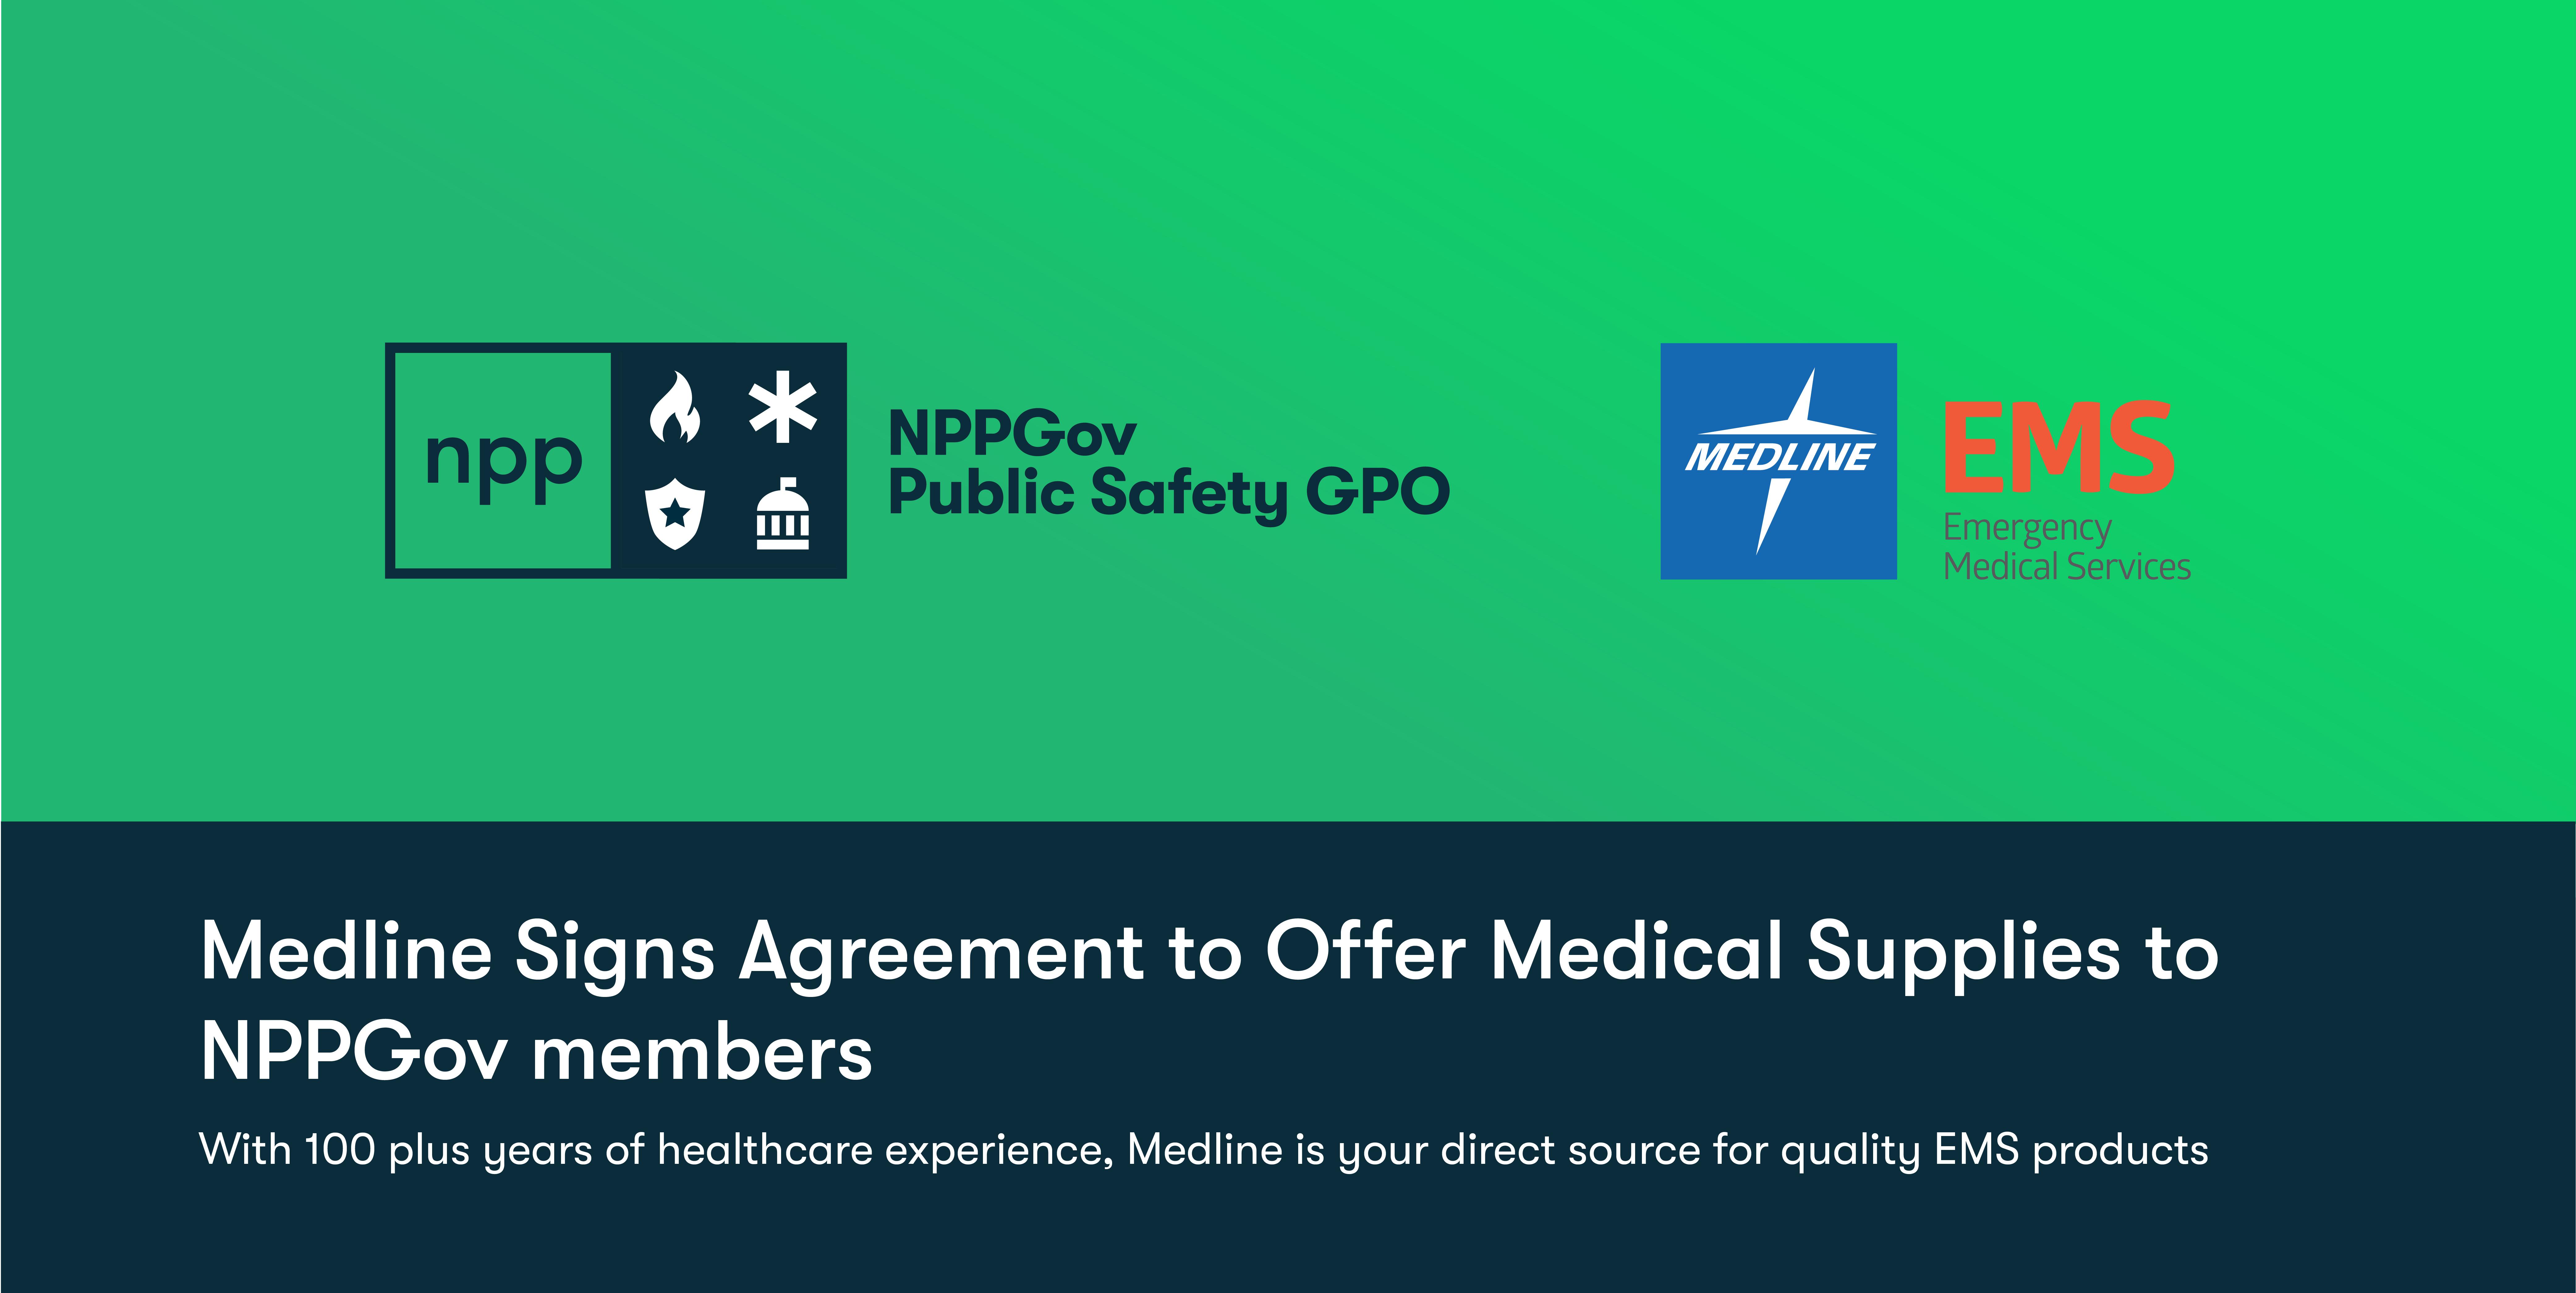 Medline Joins NPPGov as an Approved Vendor Offering Top-Notch Medical Supplies